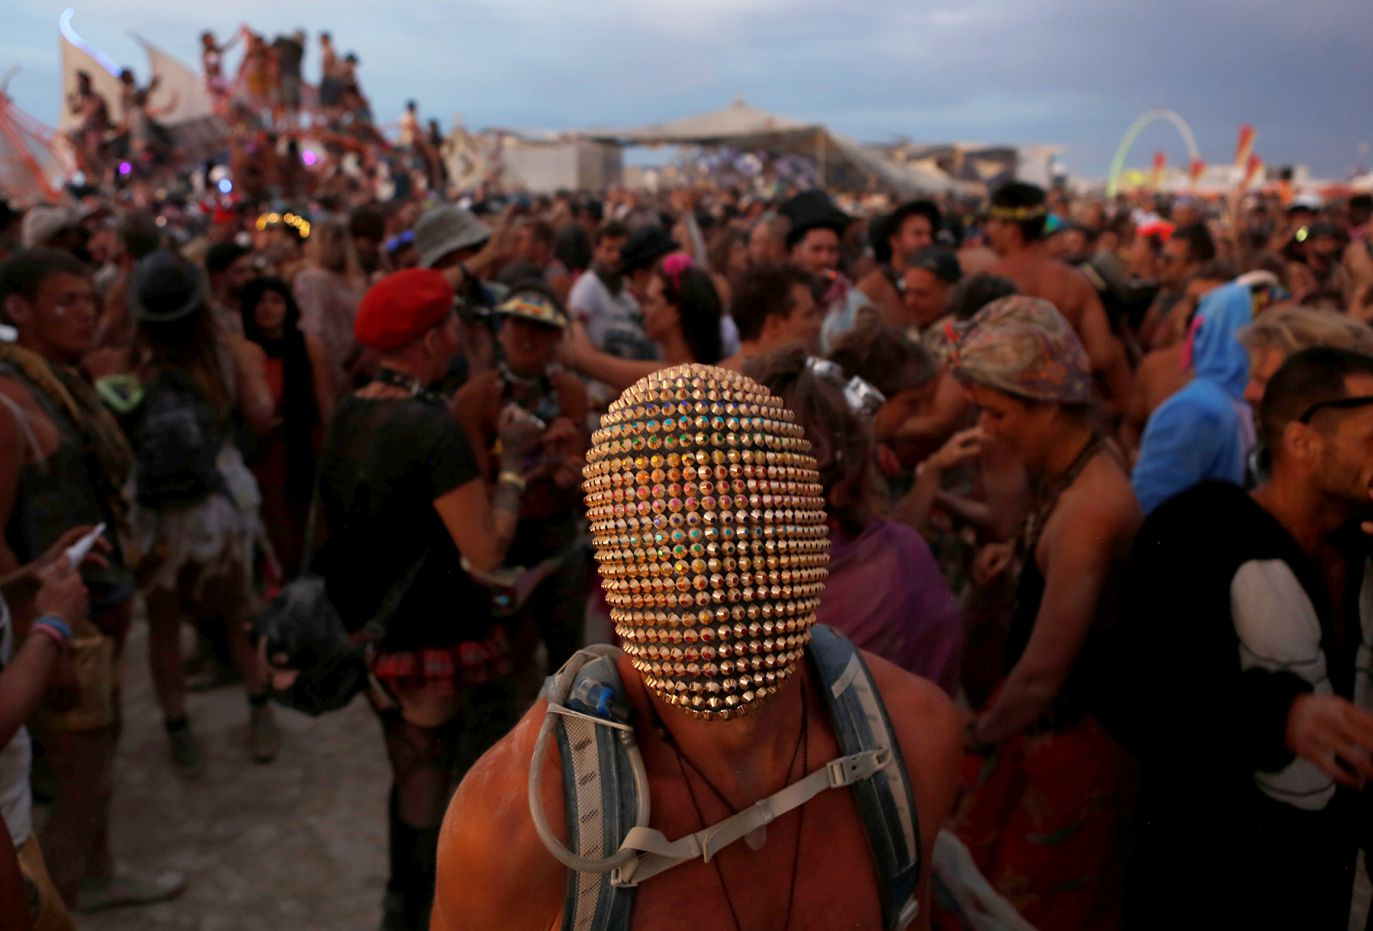 (fot. REUTERS/Jim Urquhart)